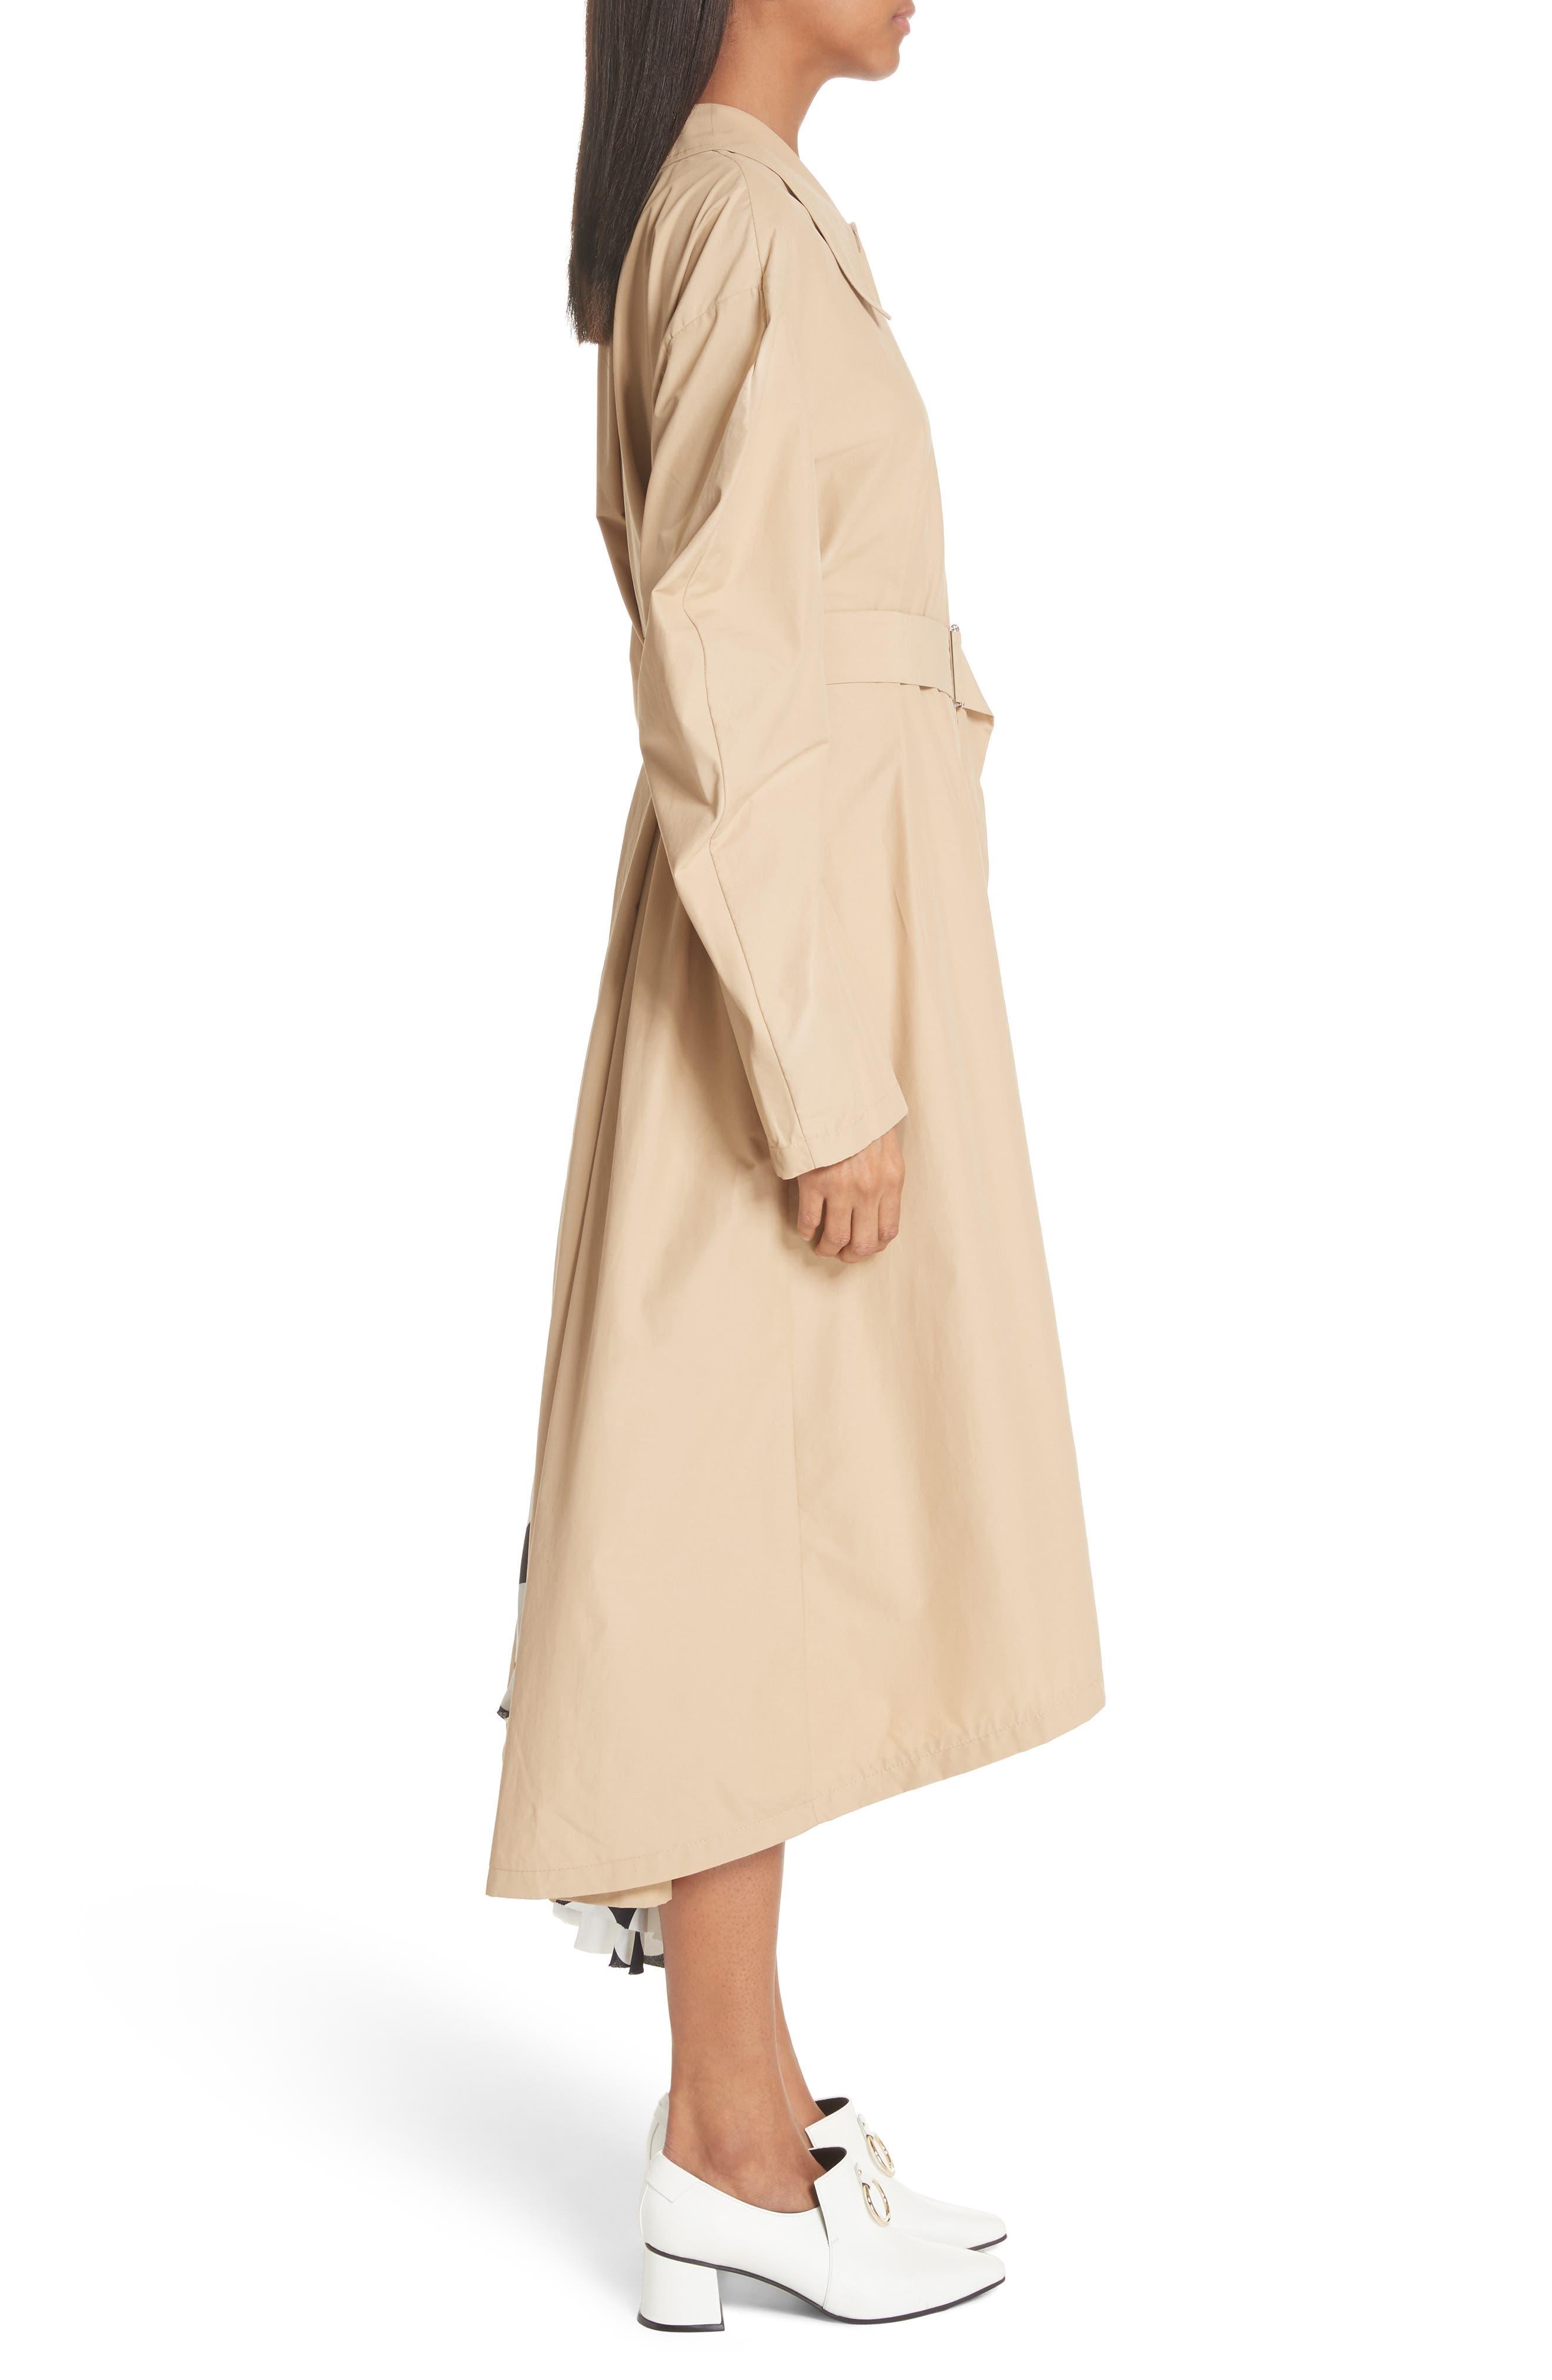 Round Sleeve Coat with Polka Dot Back Panel,                             Alternate thumbnail 3, color,